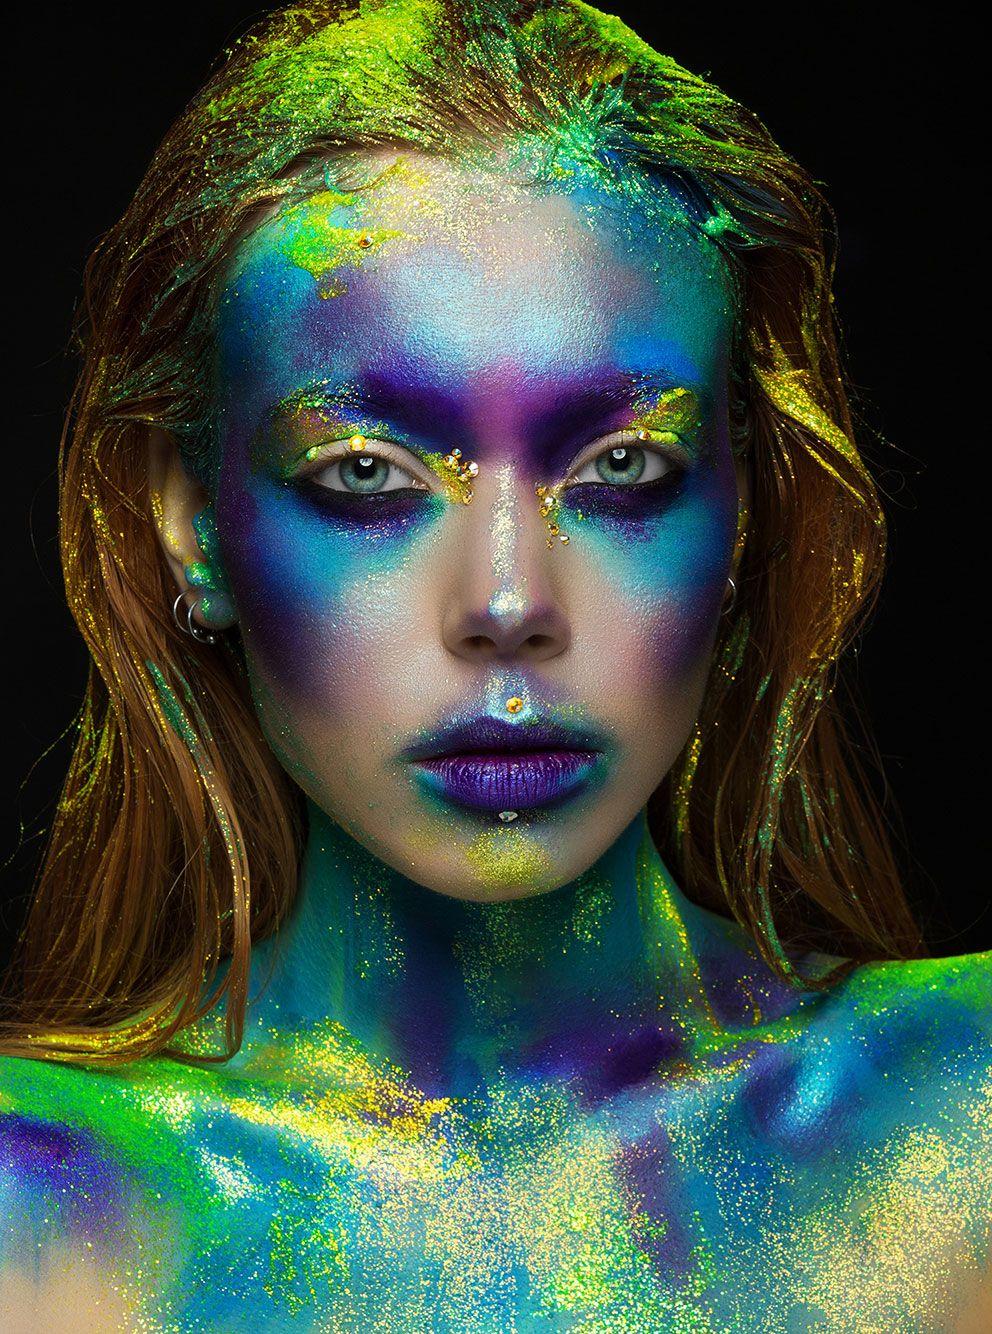 Makeup Maquiagem Fantastik makyaj, Karakter makyajı